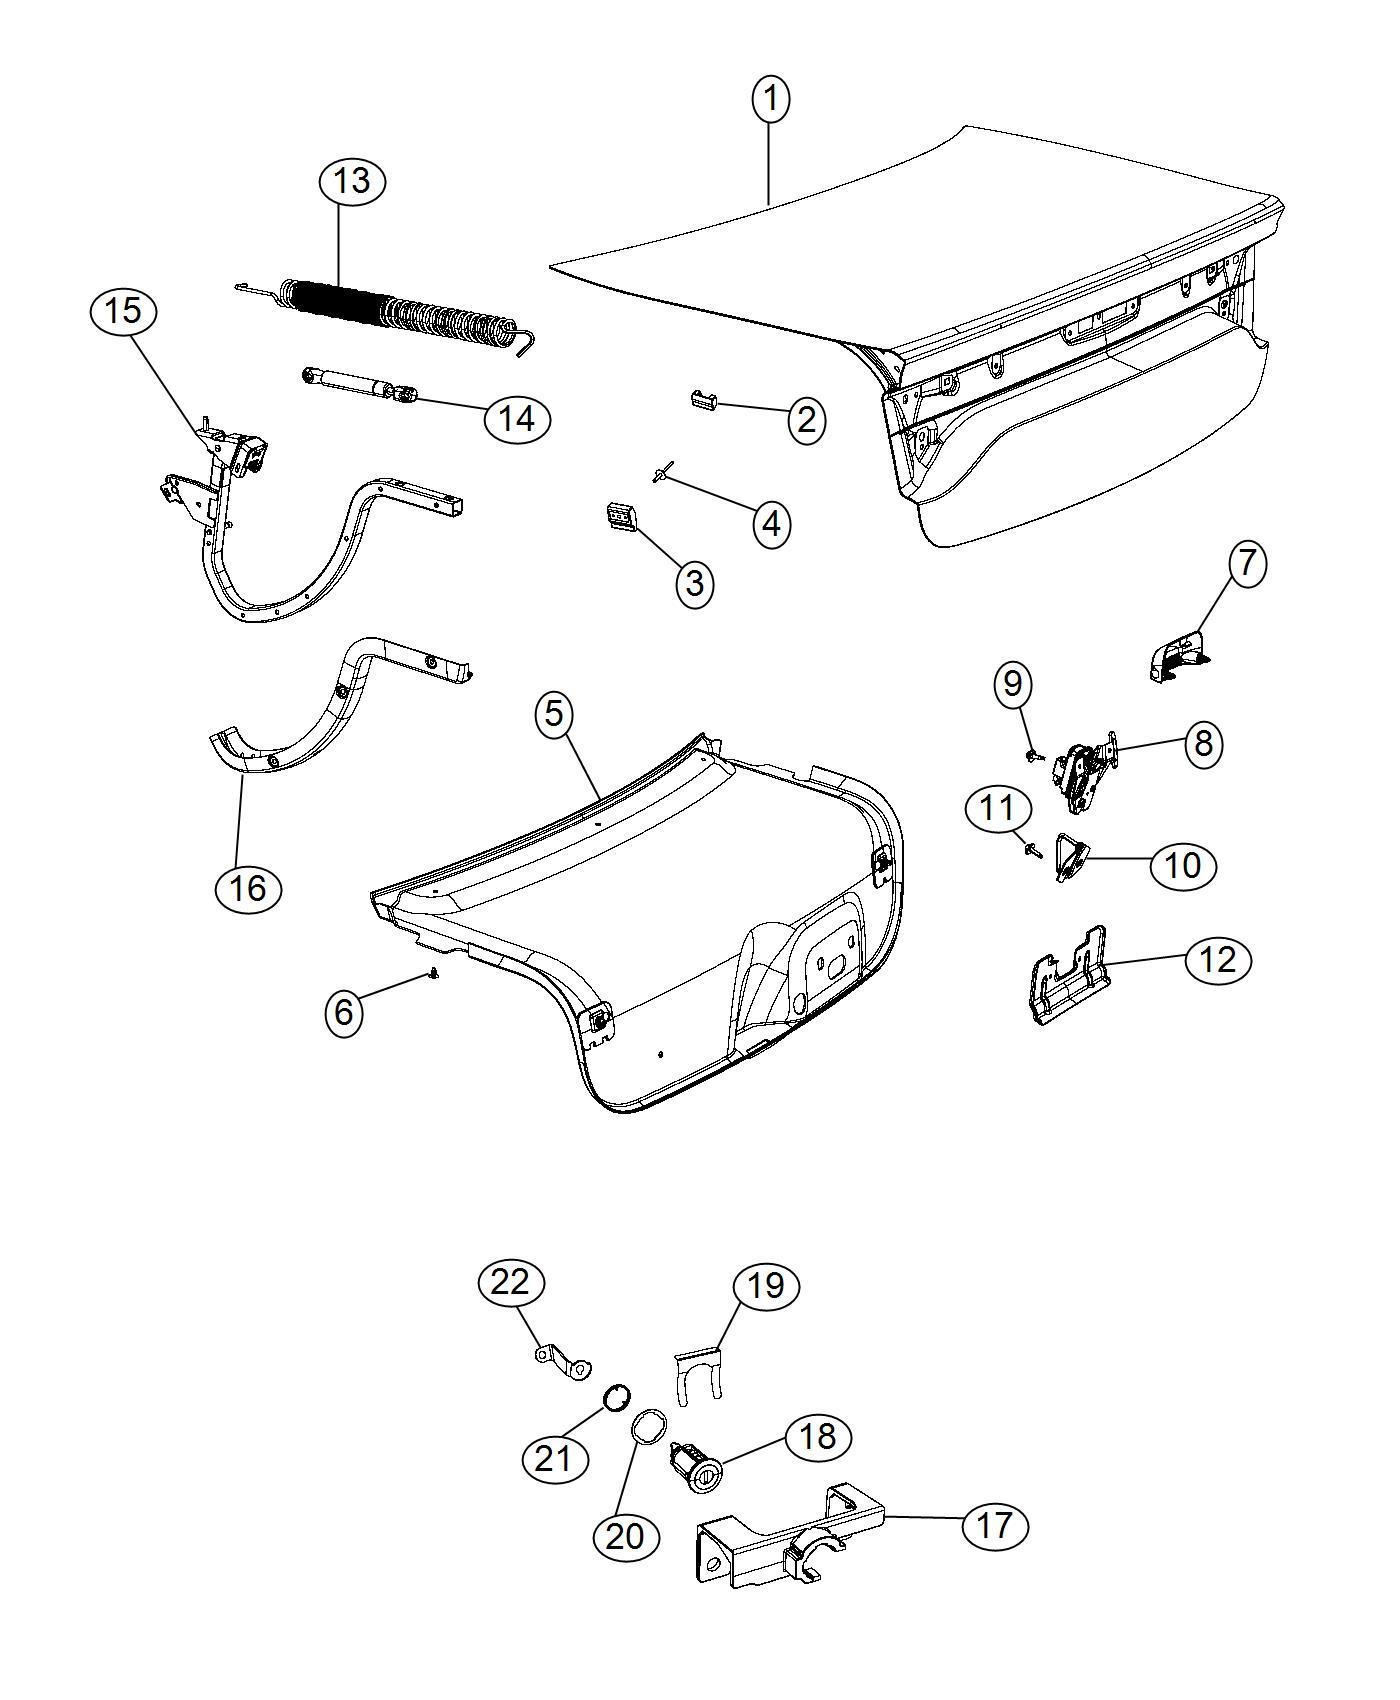 Dodge Charger Rivet M4 75x17 02 Receivers